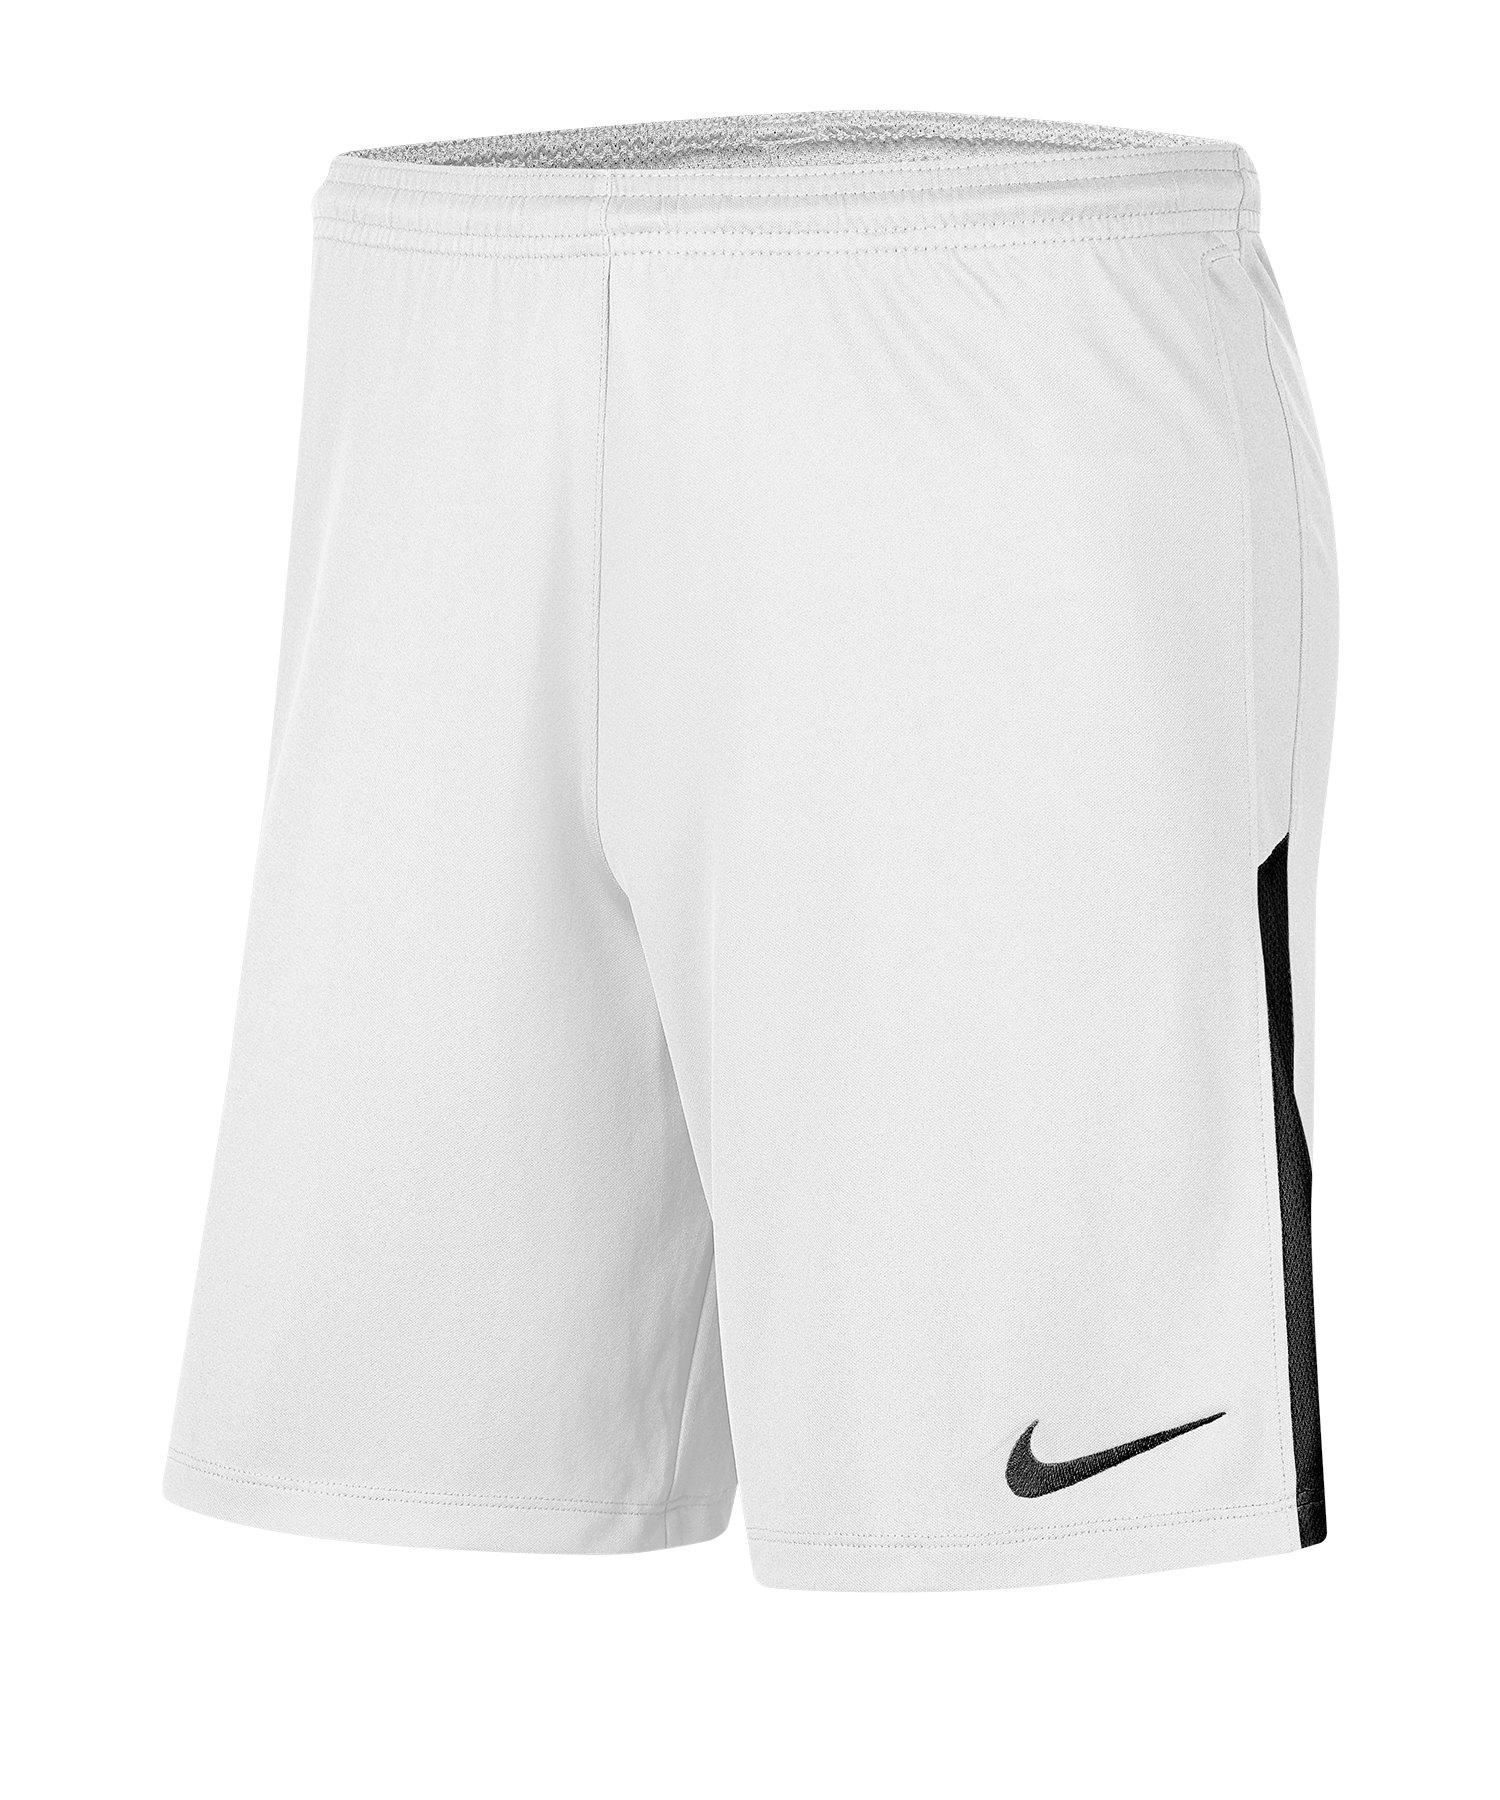 Nike League Knit II Short Kids Weiss F100 - weiss